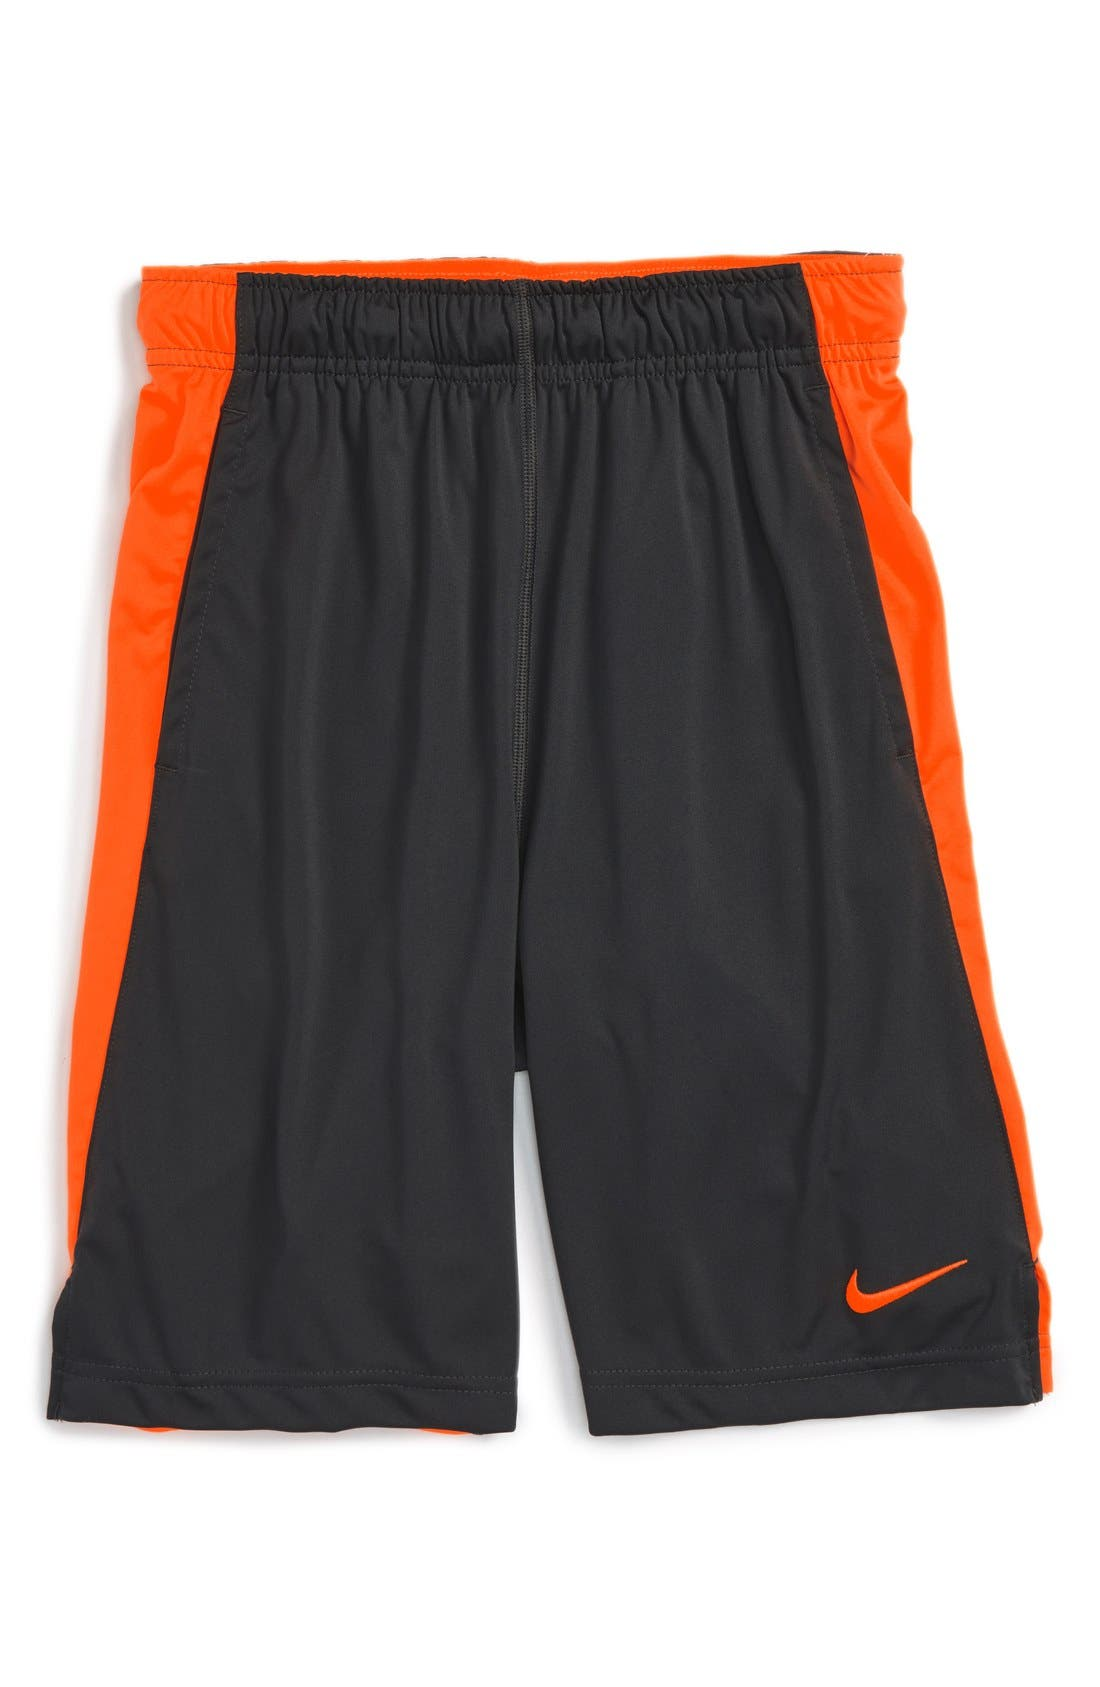 'Fly' Dri-FIT Training Shorts,                             Main thumbnail 1, color,                             Anthracite/ Orange